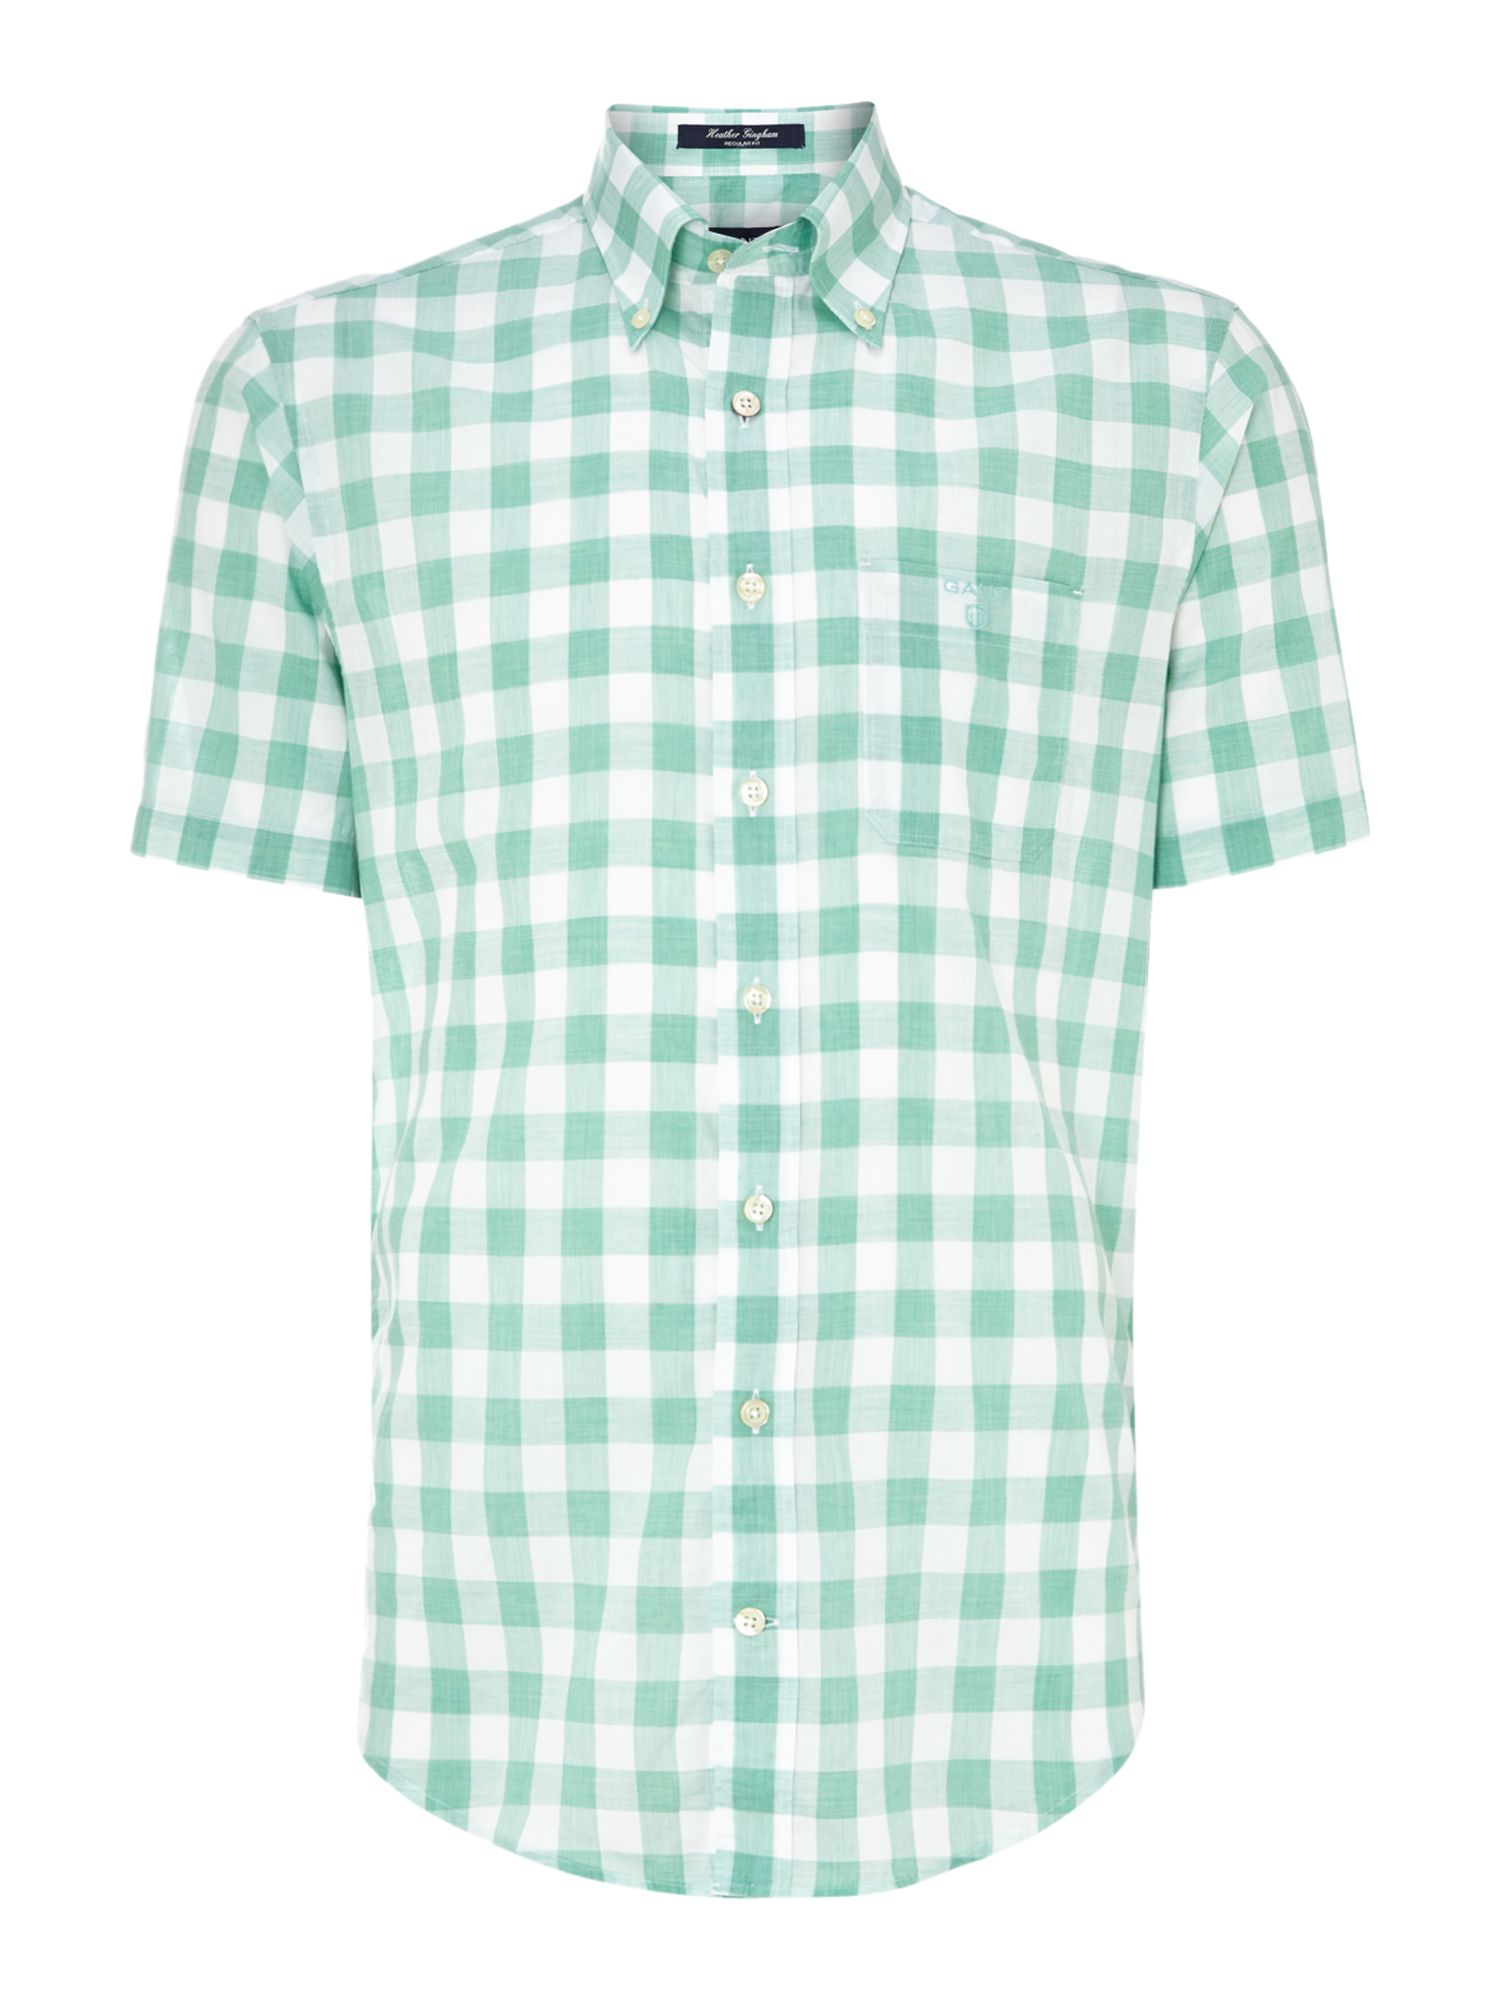 Gant Short Sleeve Gingham Shirt In Green For Men Sage Lyst